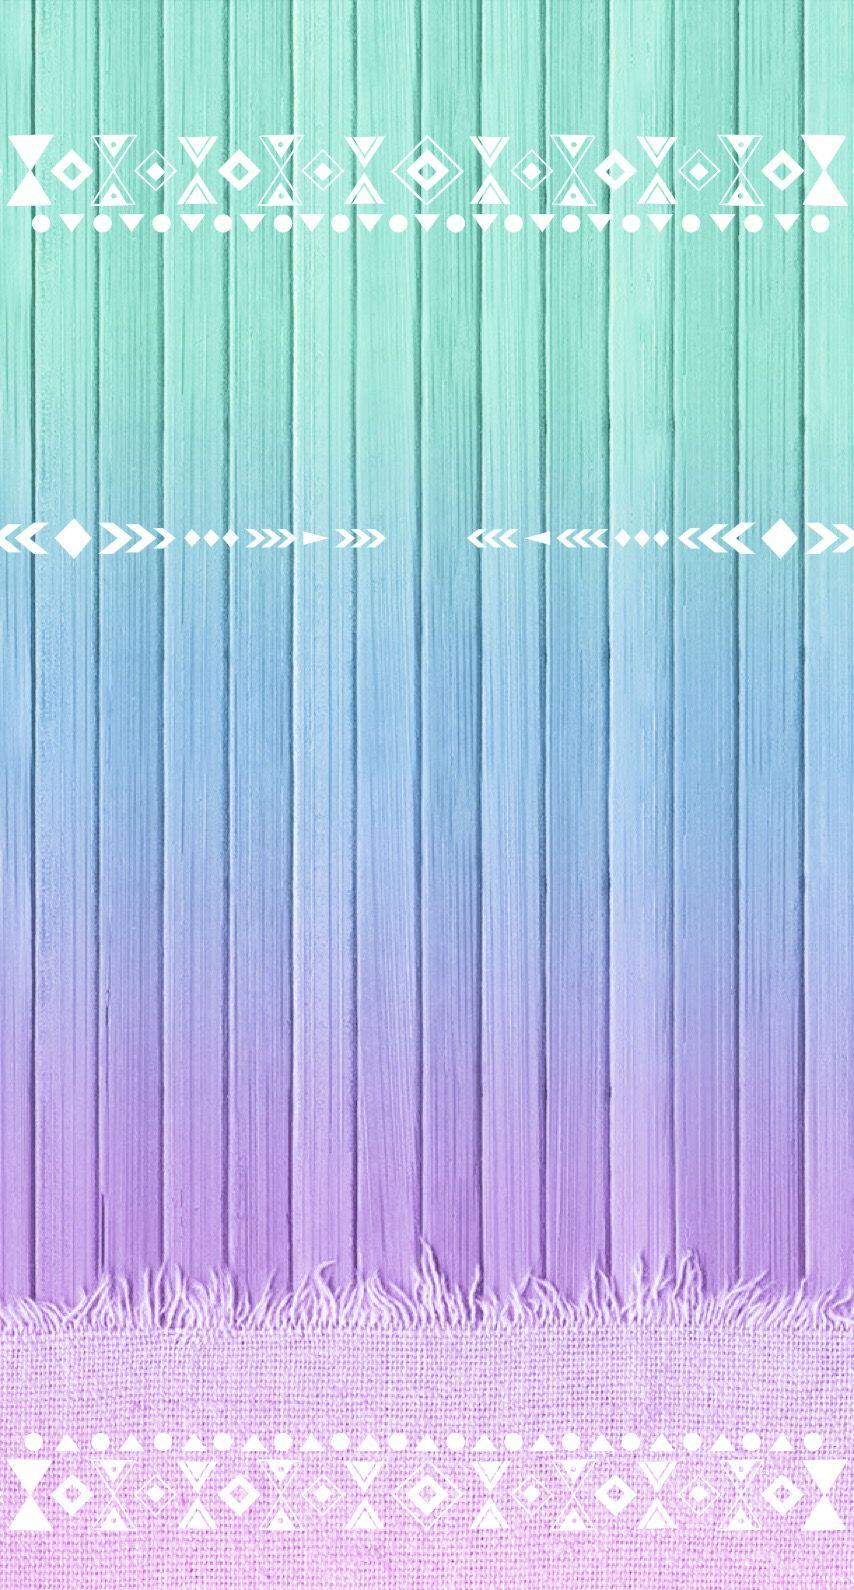 Iphone Backgrounds Matching Lock Screen And Home Screen 854x1590 Wallpaper Teahub Io